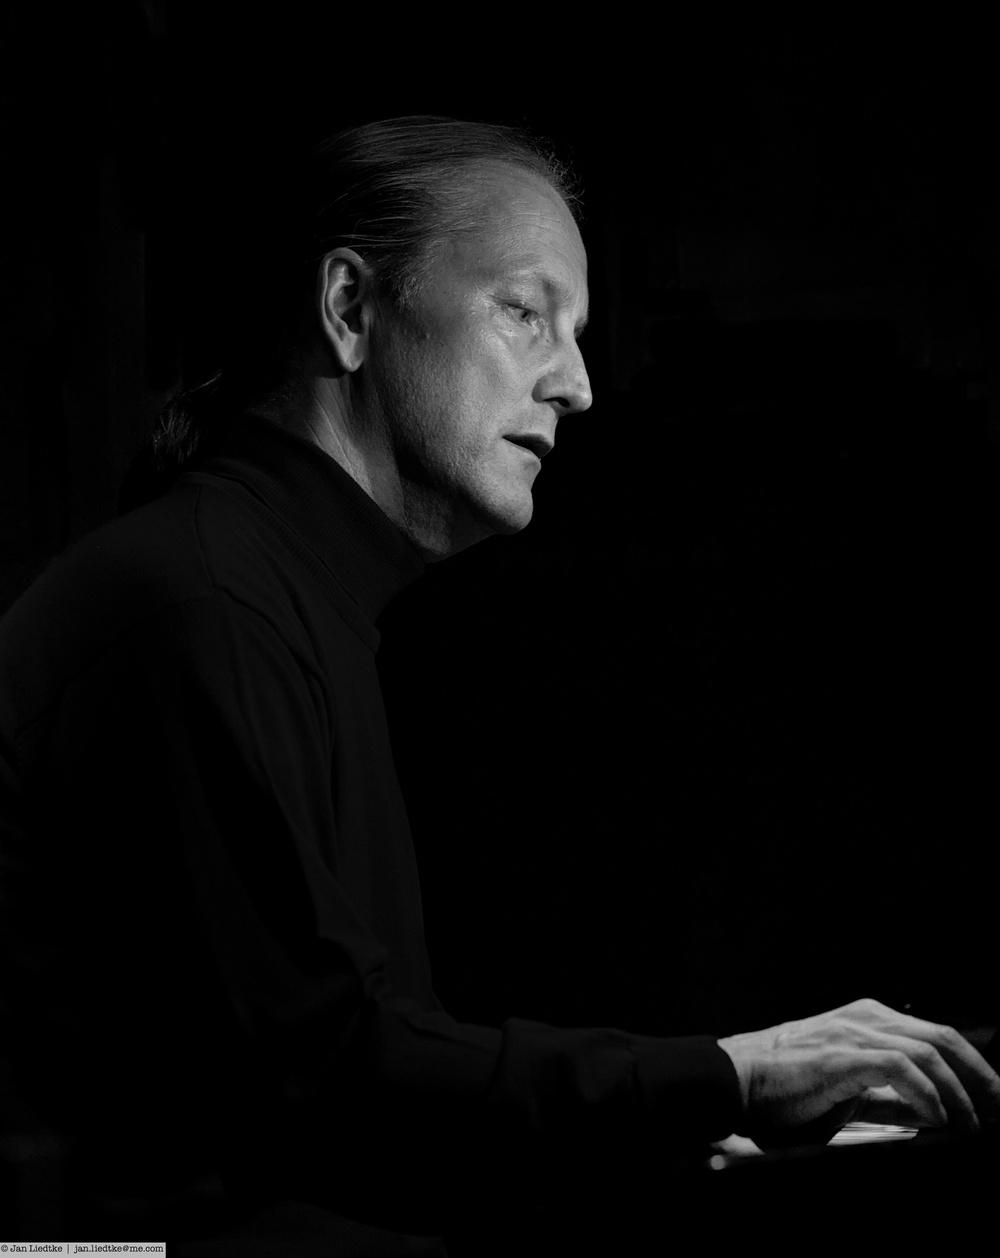 Quiet moment with pianist Markus Kvits